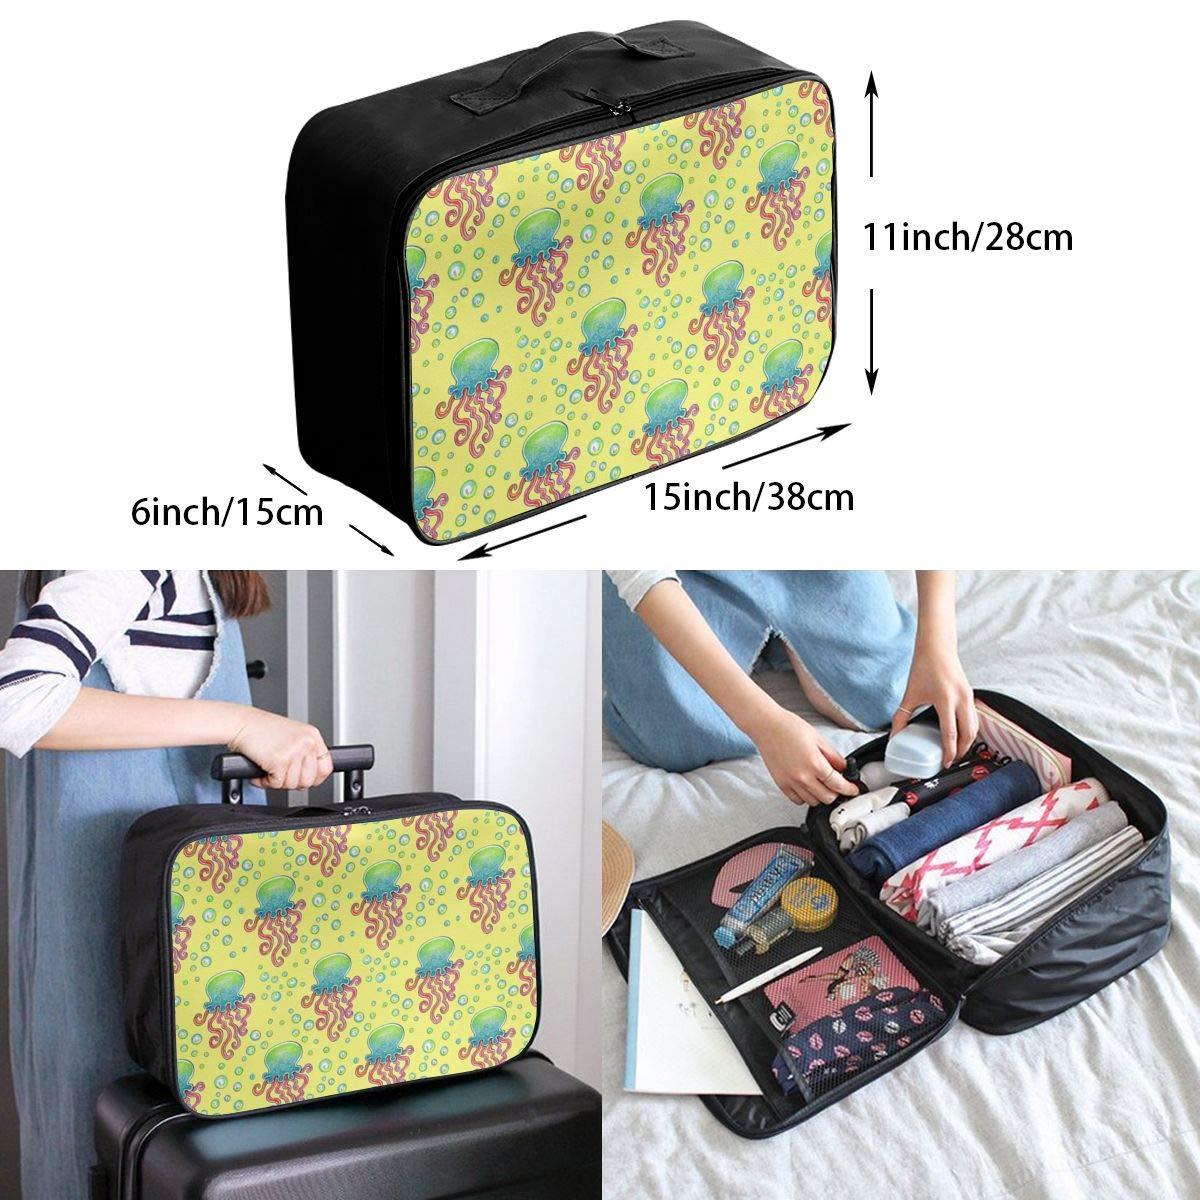 Travel Luggage Duffle Bag Lightweight Portable Handbag Cute Jellyfish Yellow Large Capacity Waterproof Foldable Storage Tote